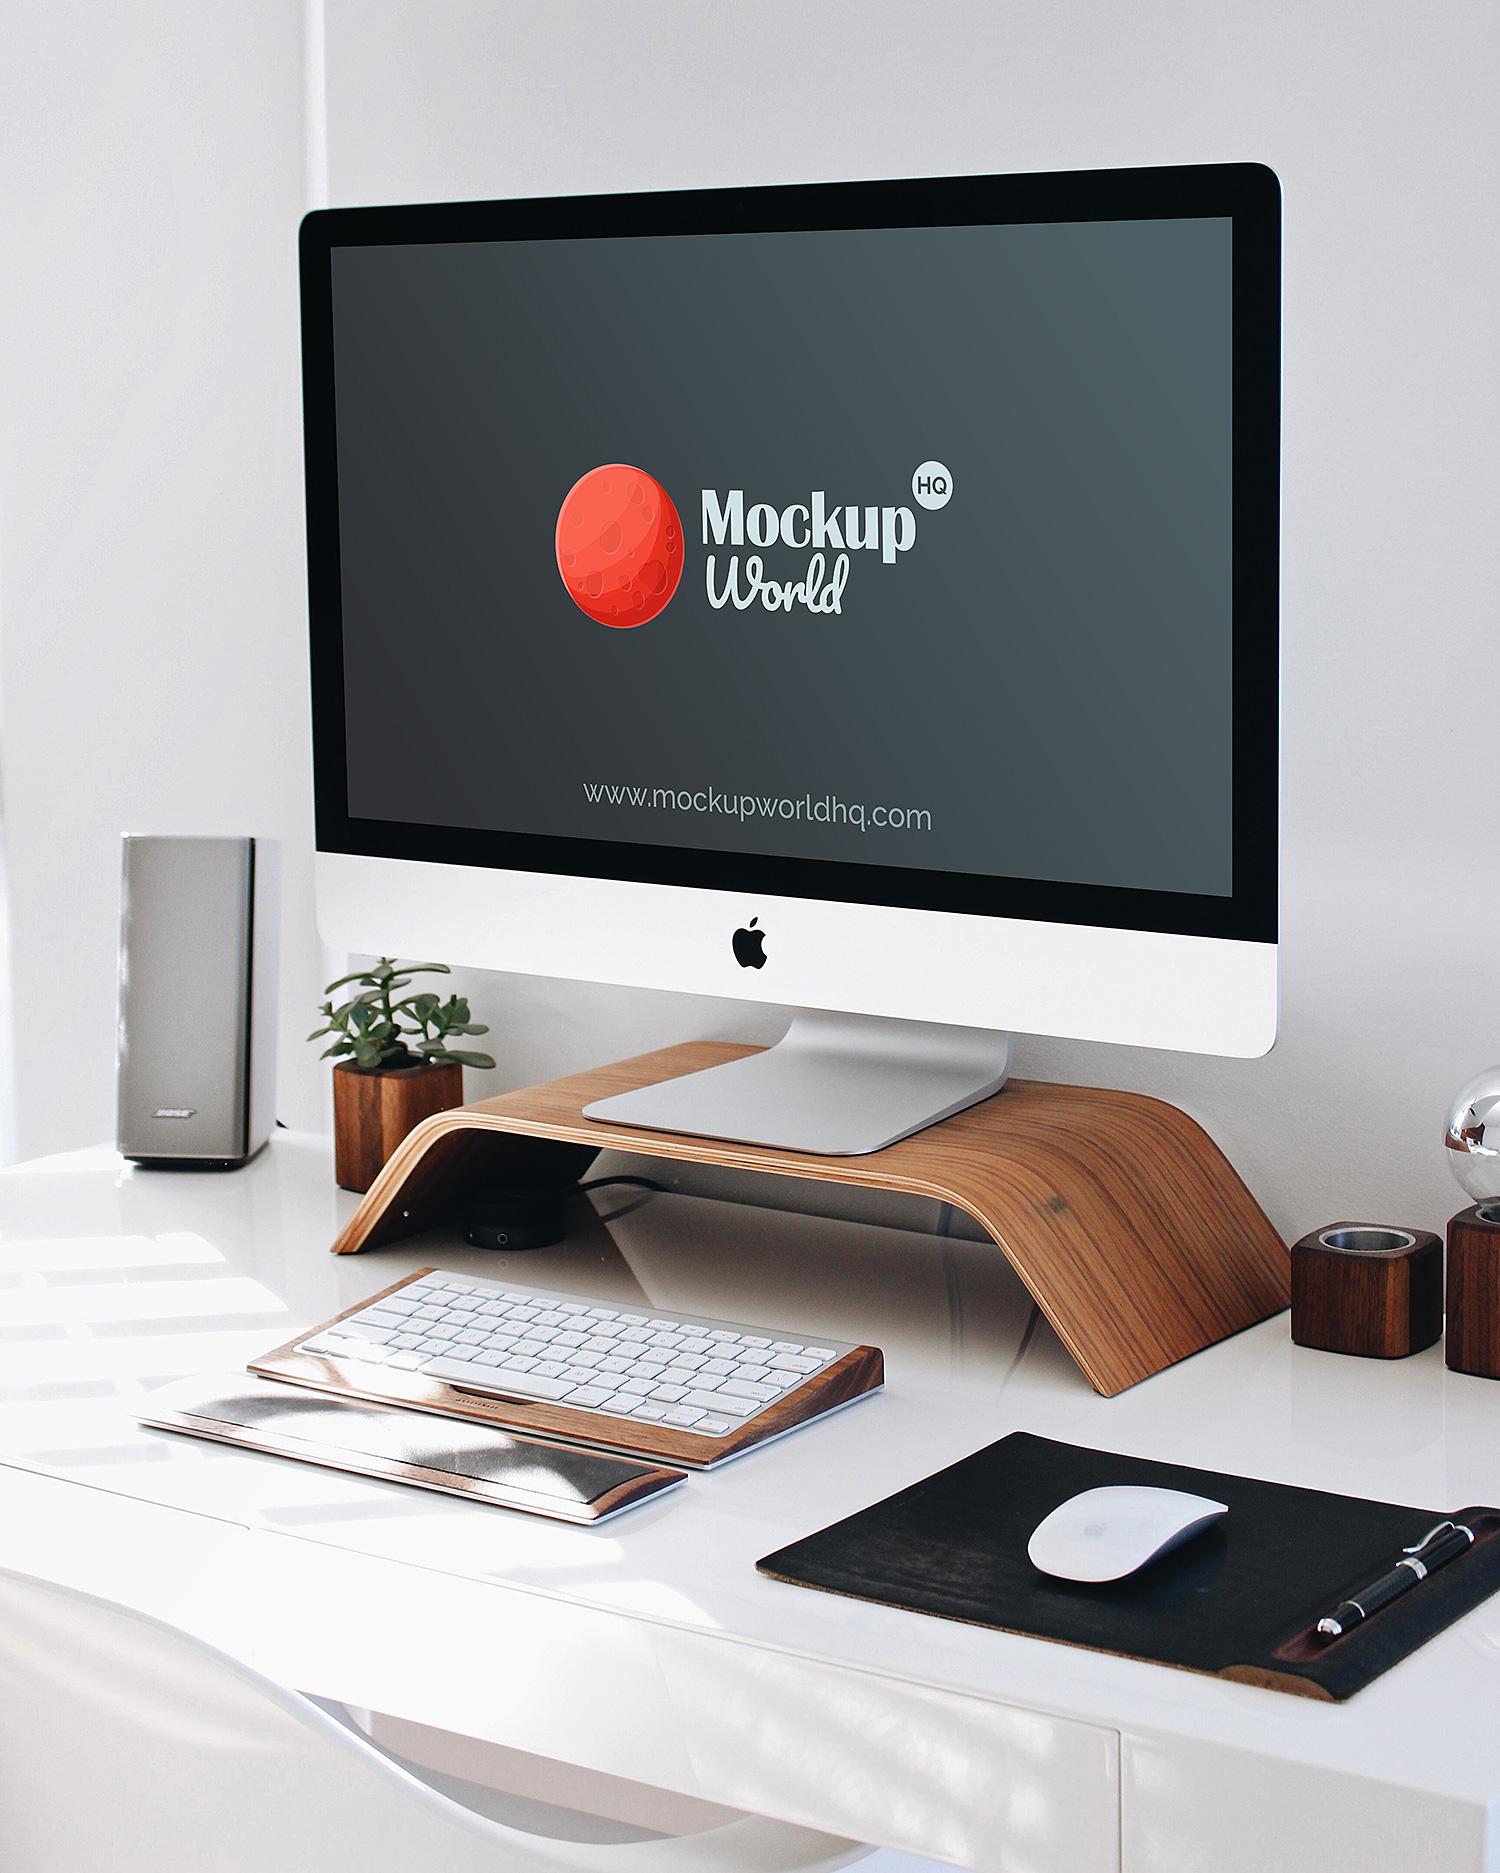 iMac Workspace Mockup PSD Free